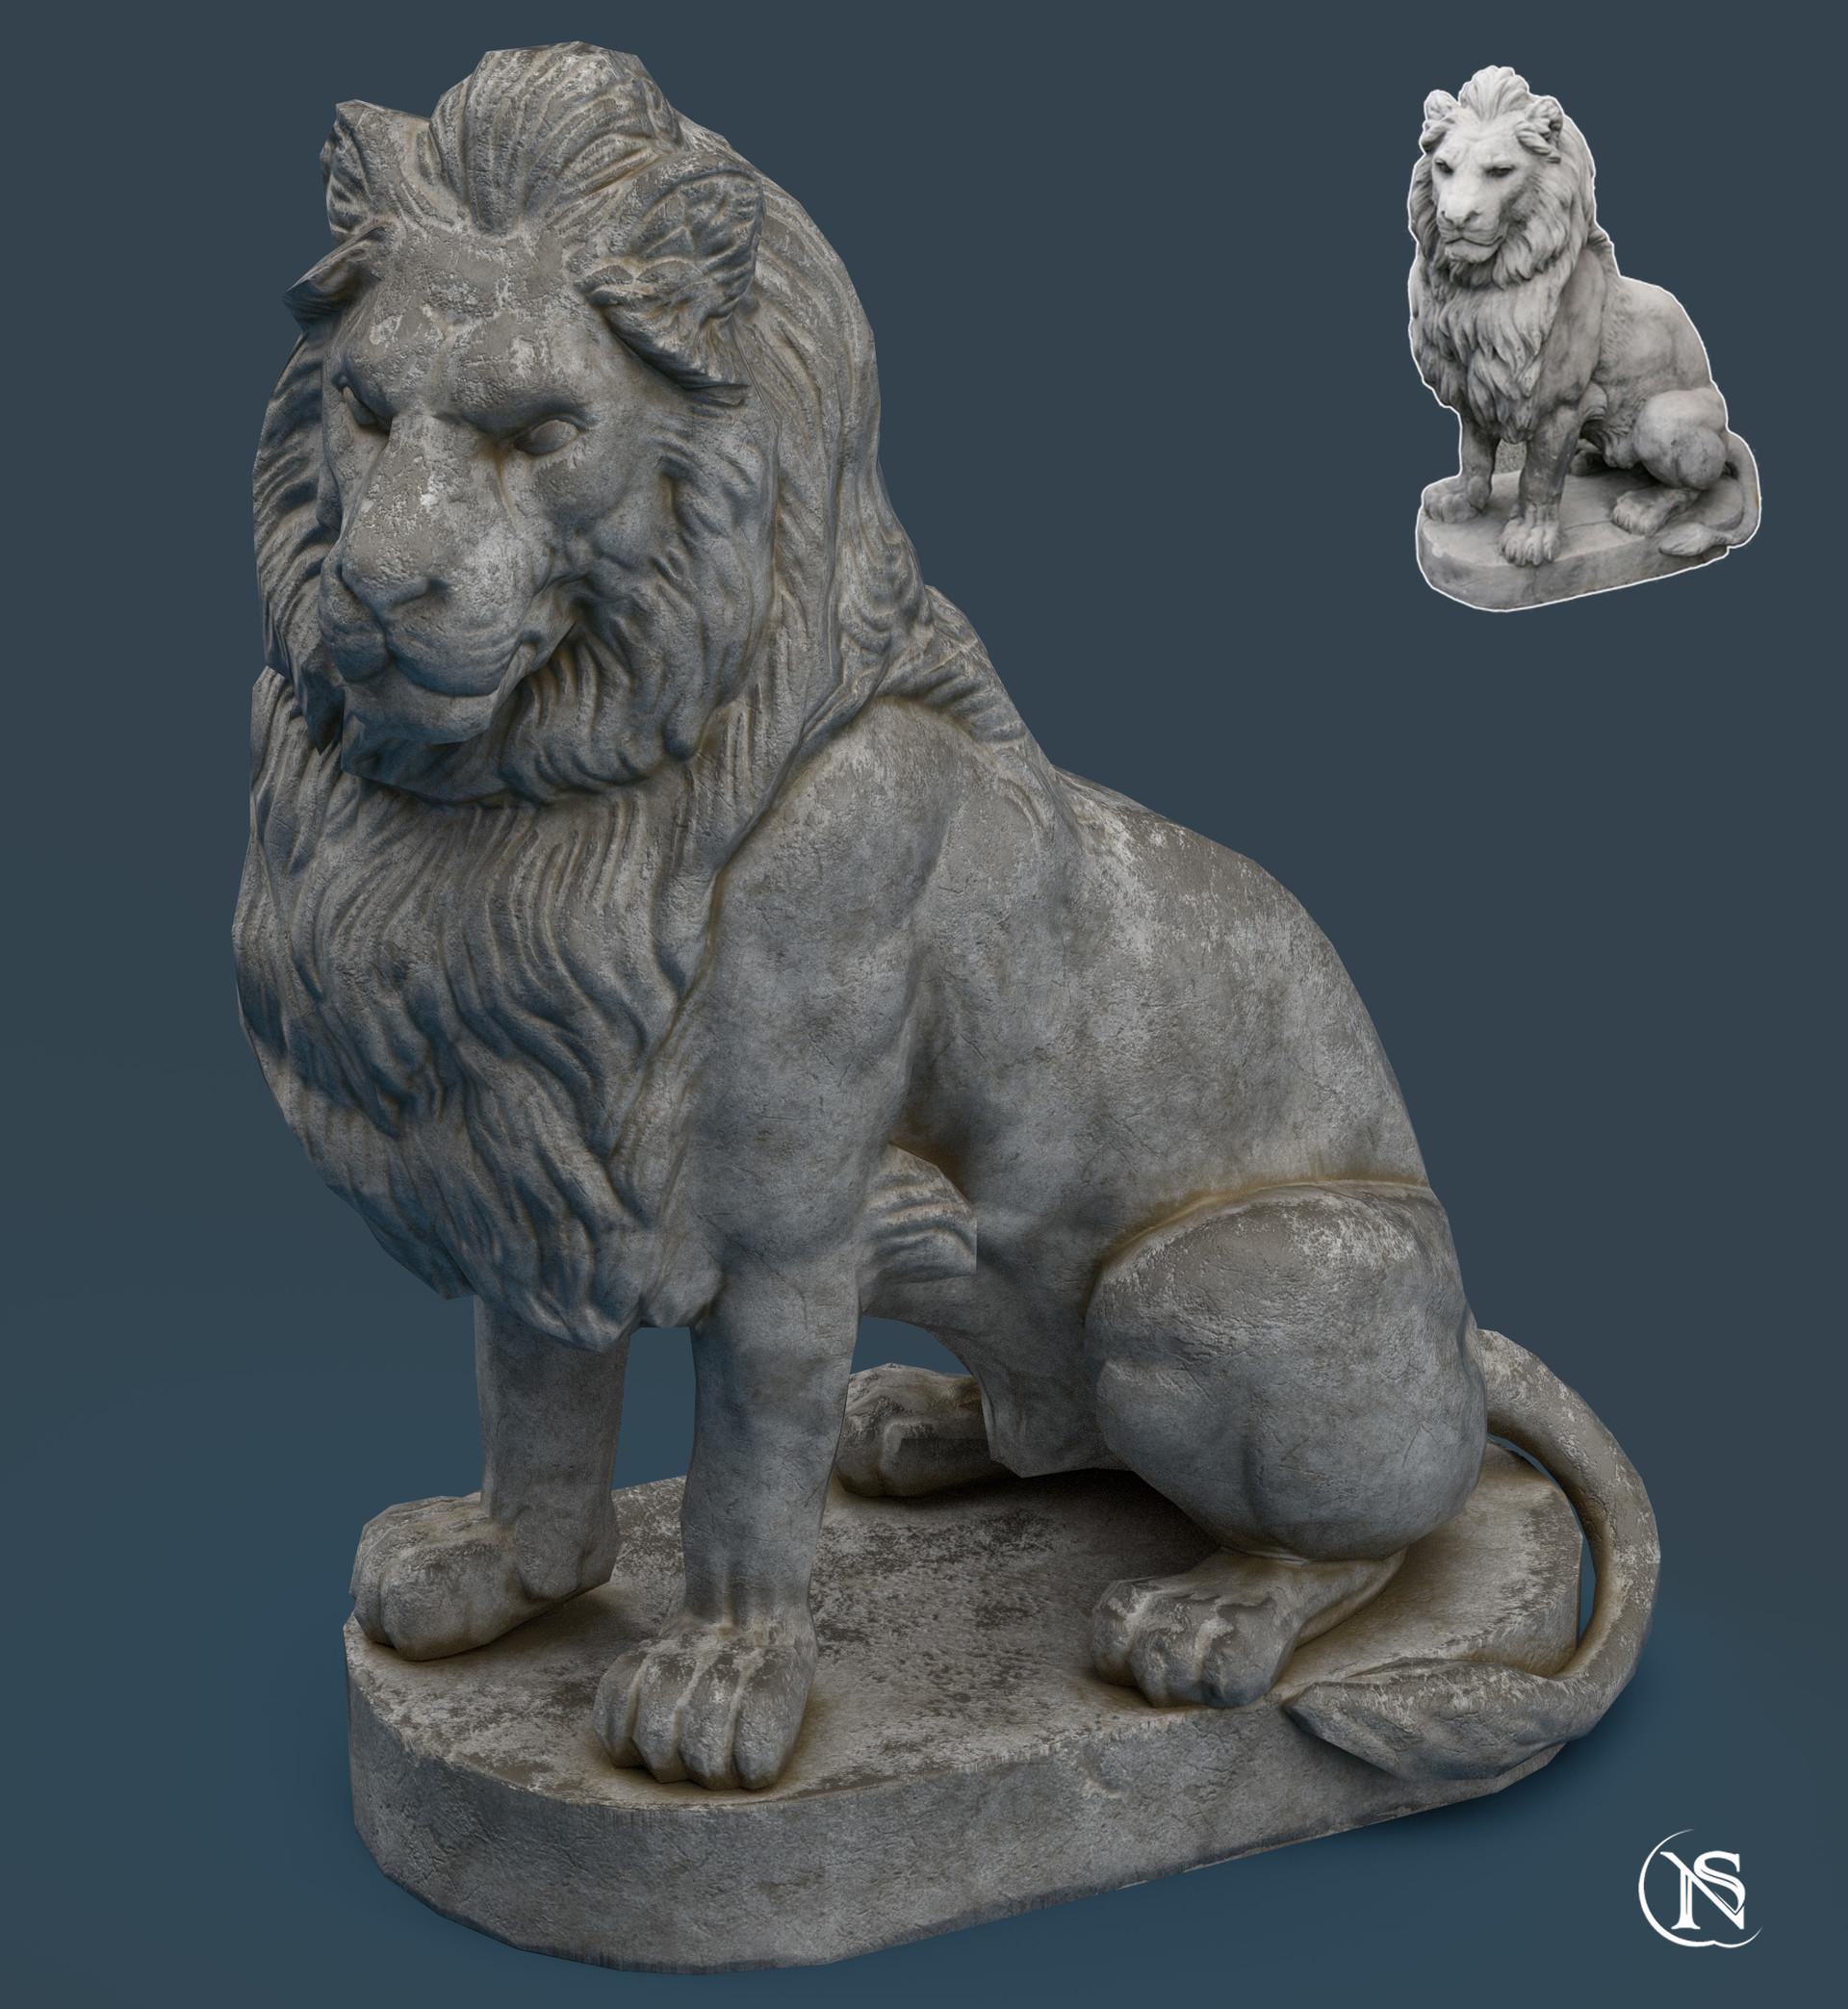 ArtStation - Lion Statue Re-Texture, Noe Serrano